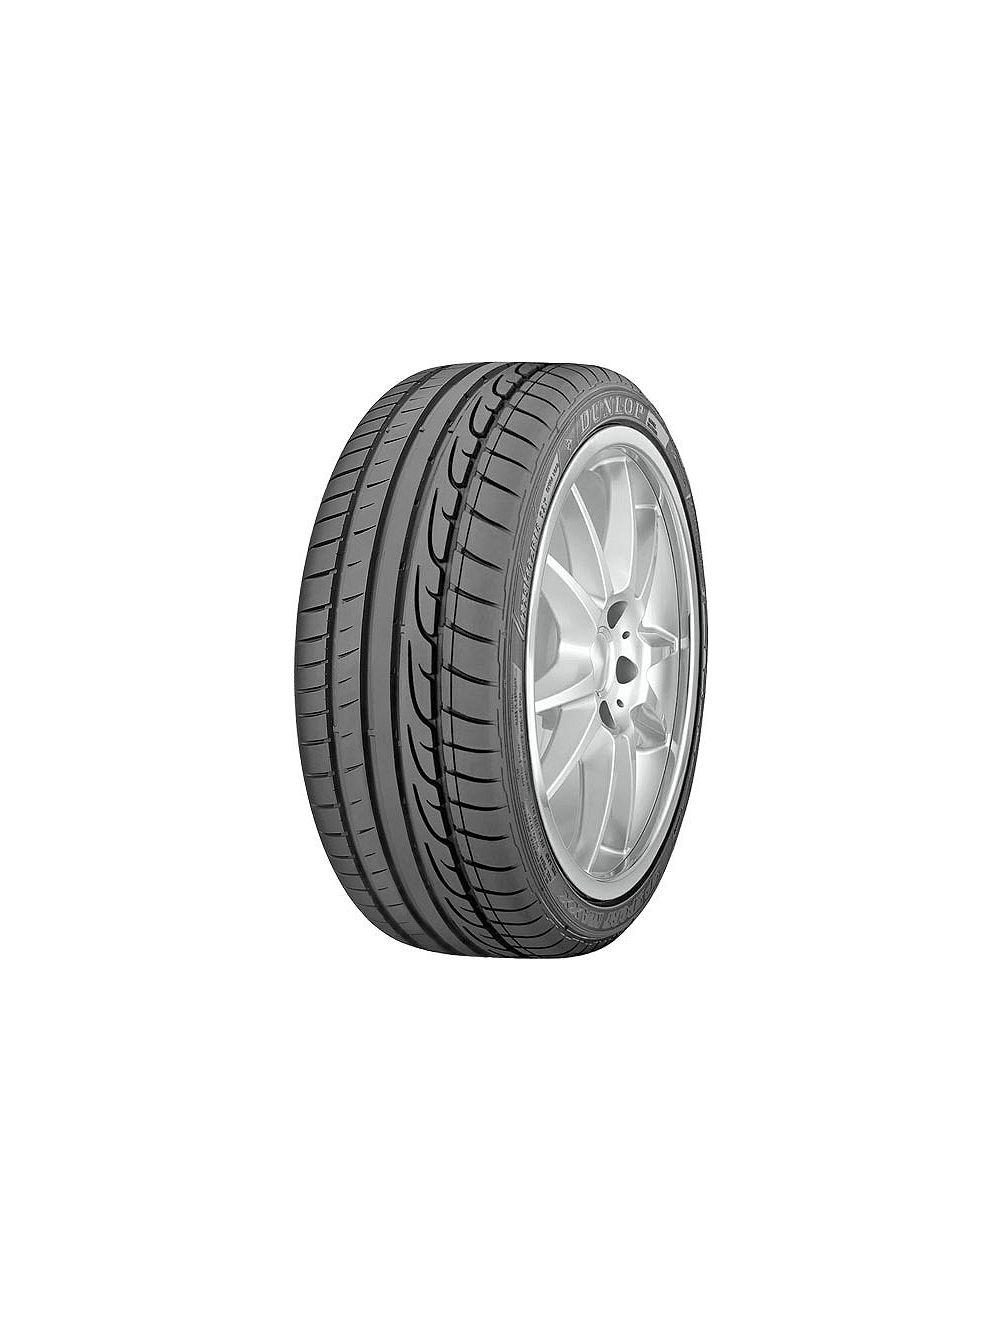 Dunlop 265/35R19 Y SP Sport MAXX RT XL MFS MO1 Nyári gumi